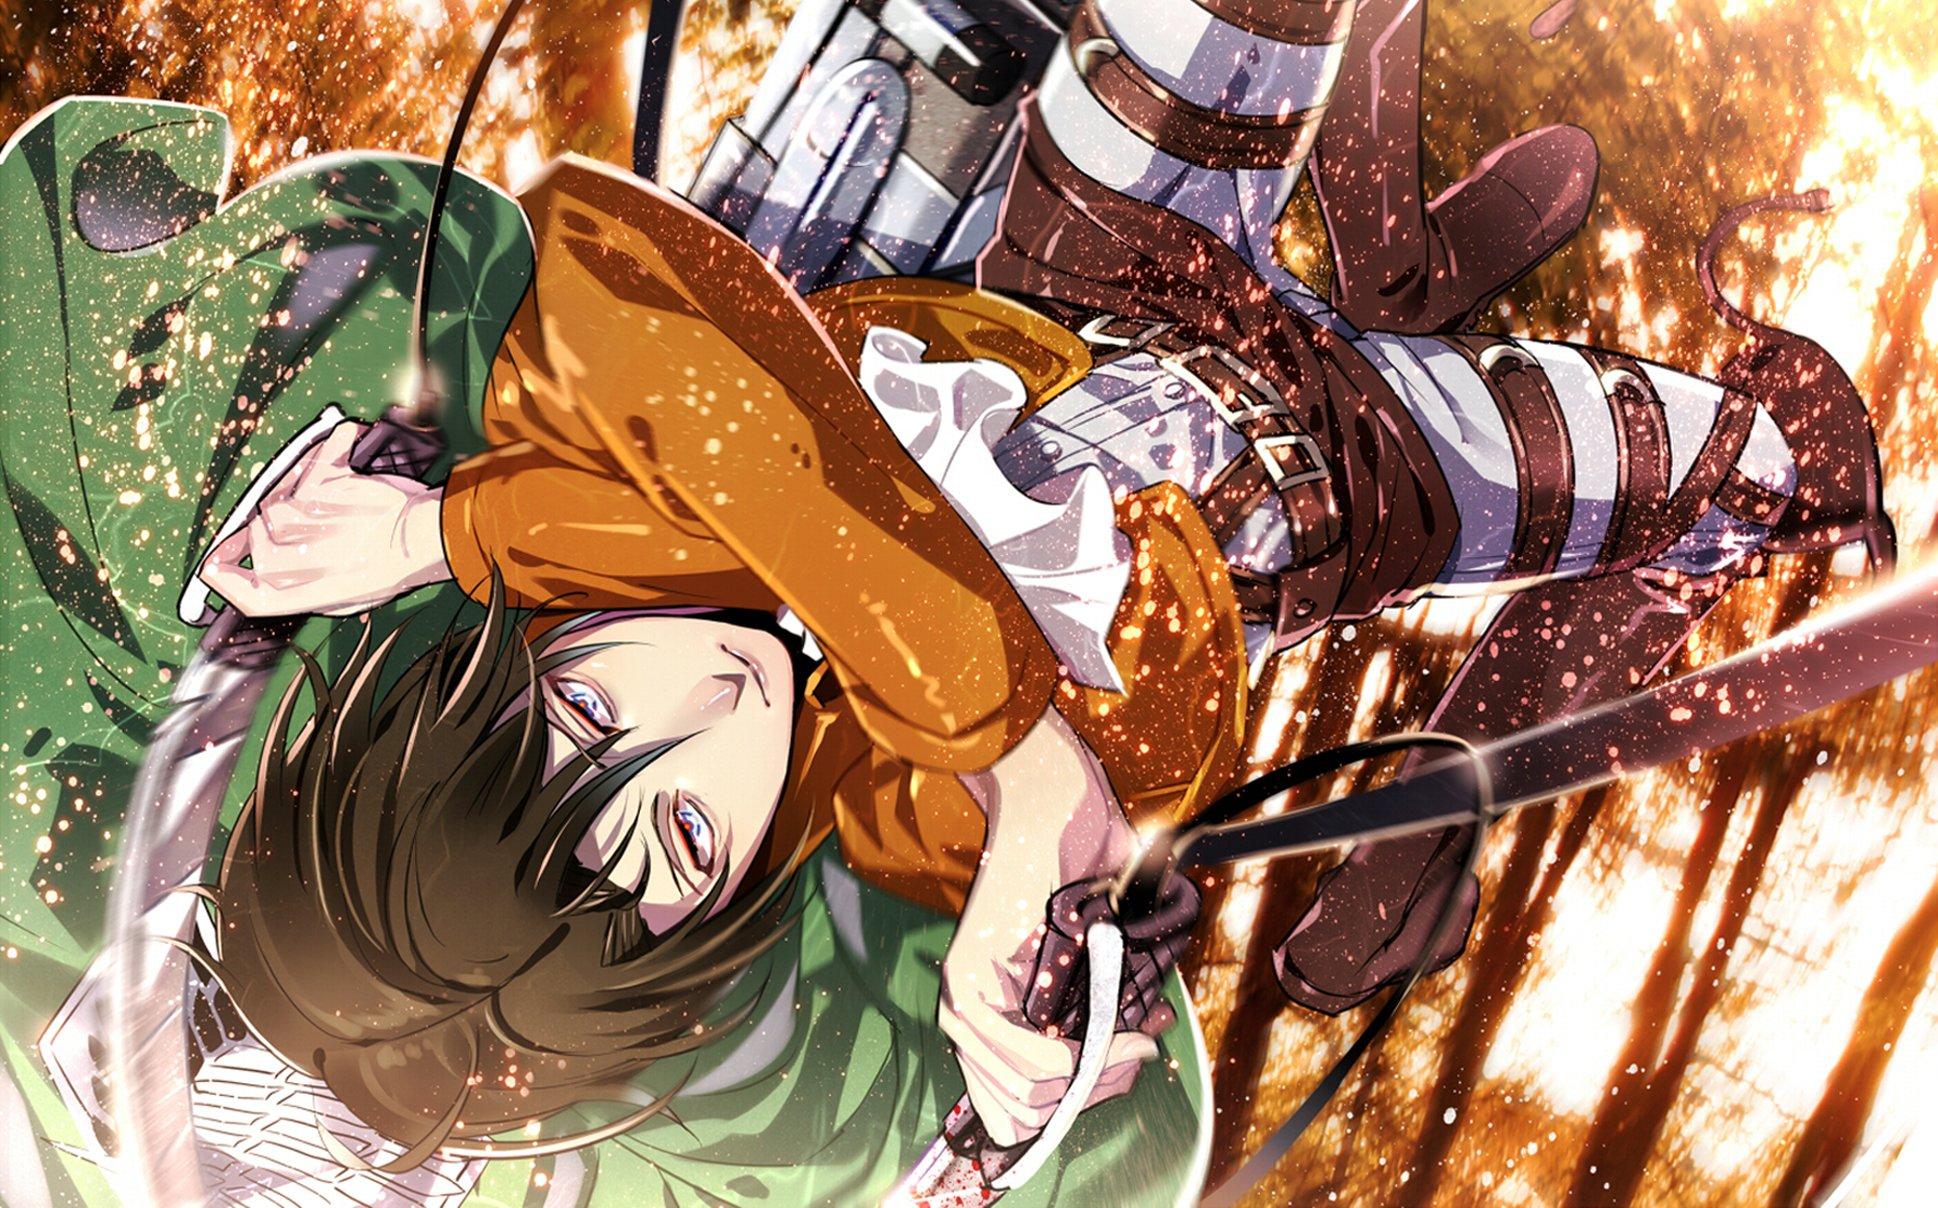 Attack On Titan Shingeki No Kyojin Guy Anime Art Rivaille Levi Wallpaper 1938x1208 932959 Wallpaperup